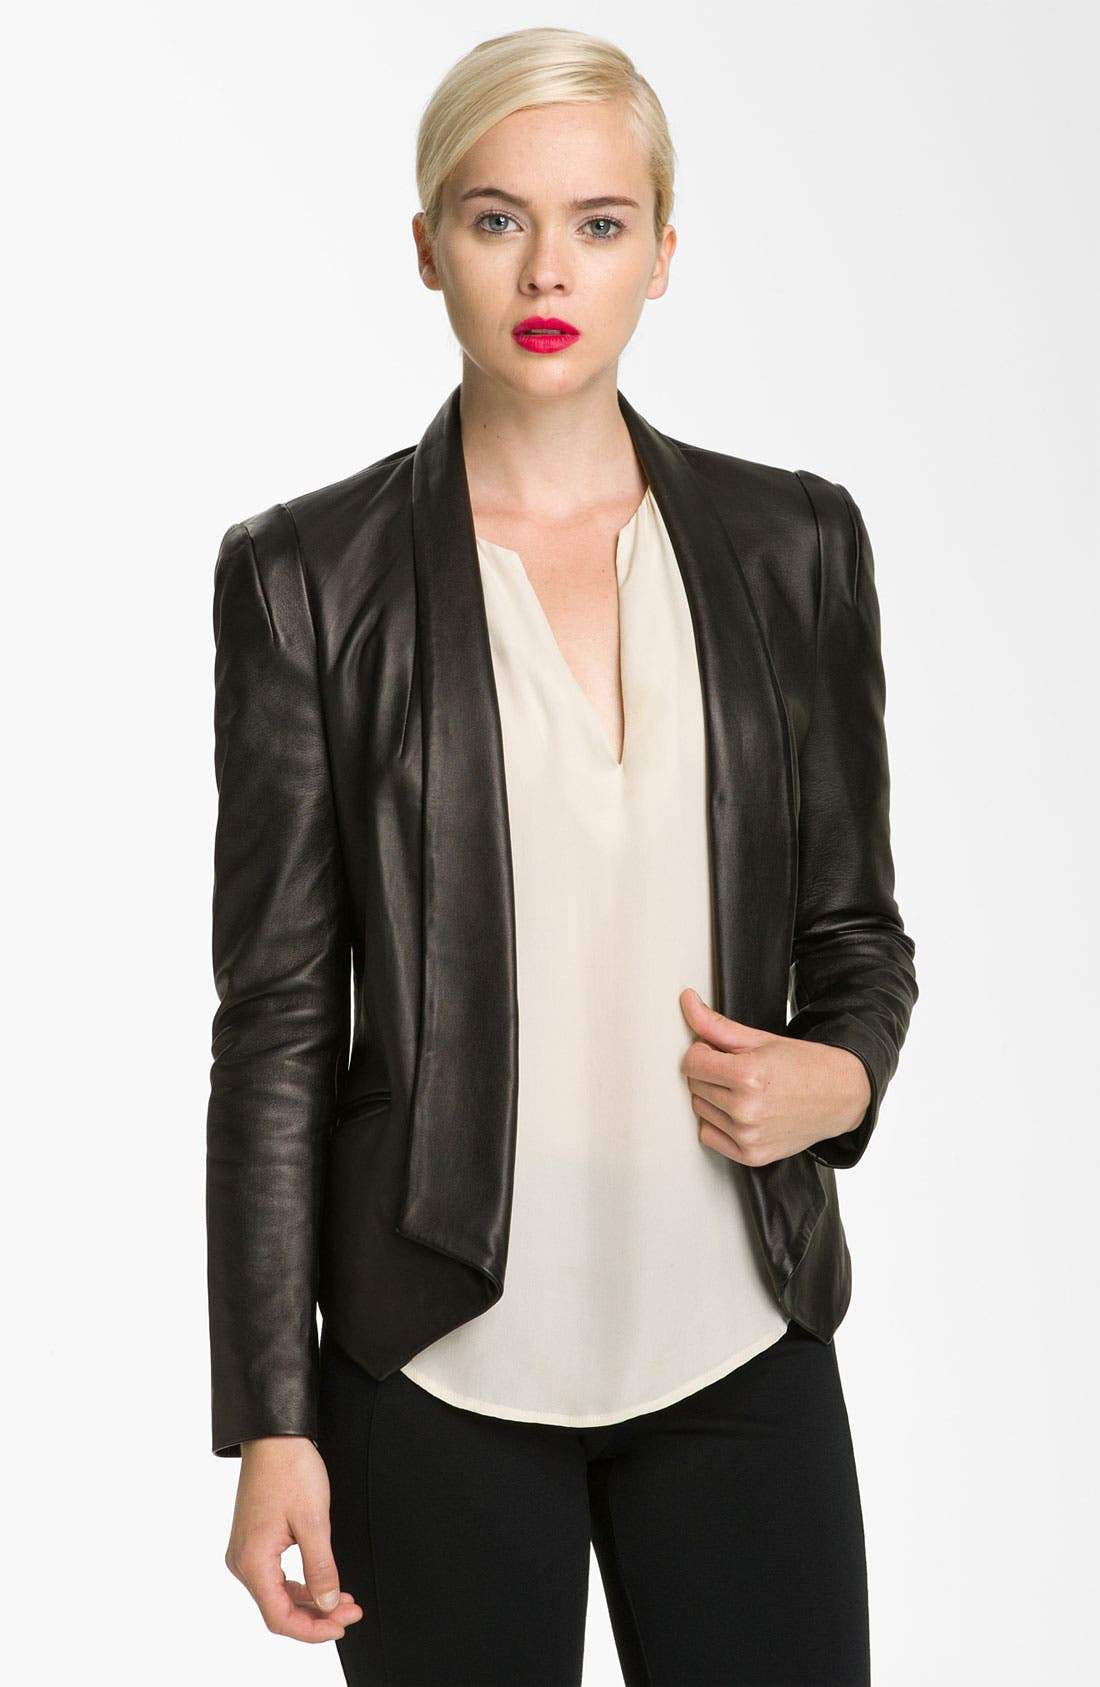 Alternate Image 1 Selected - Rebecca Minkoff 'Becky' Leather Jacket